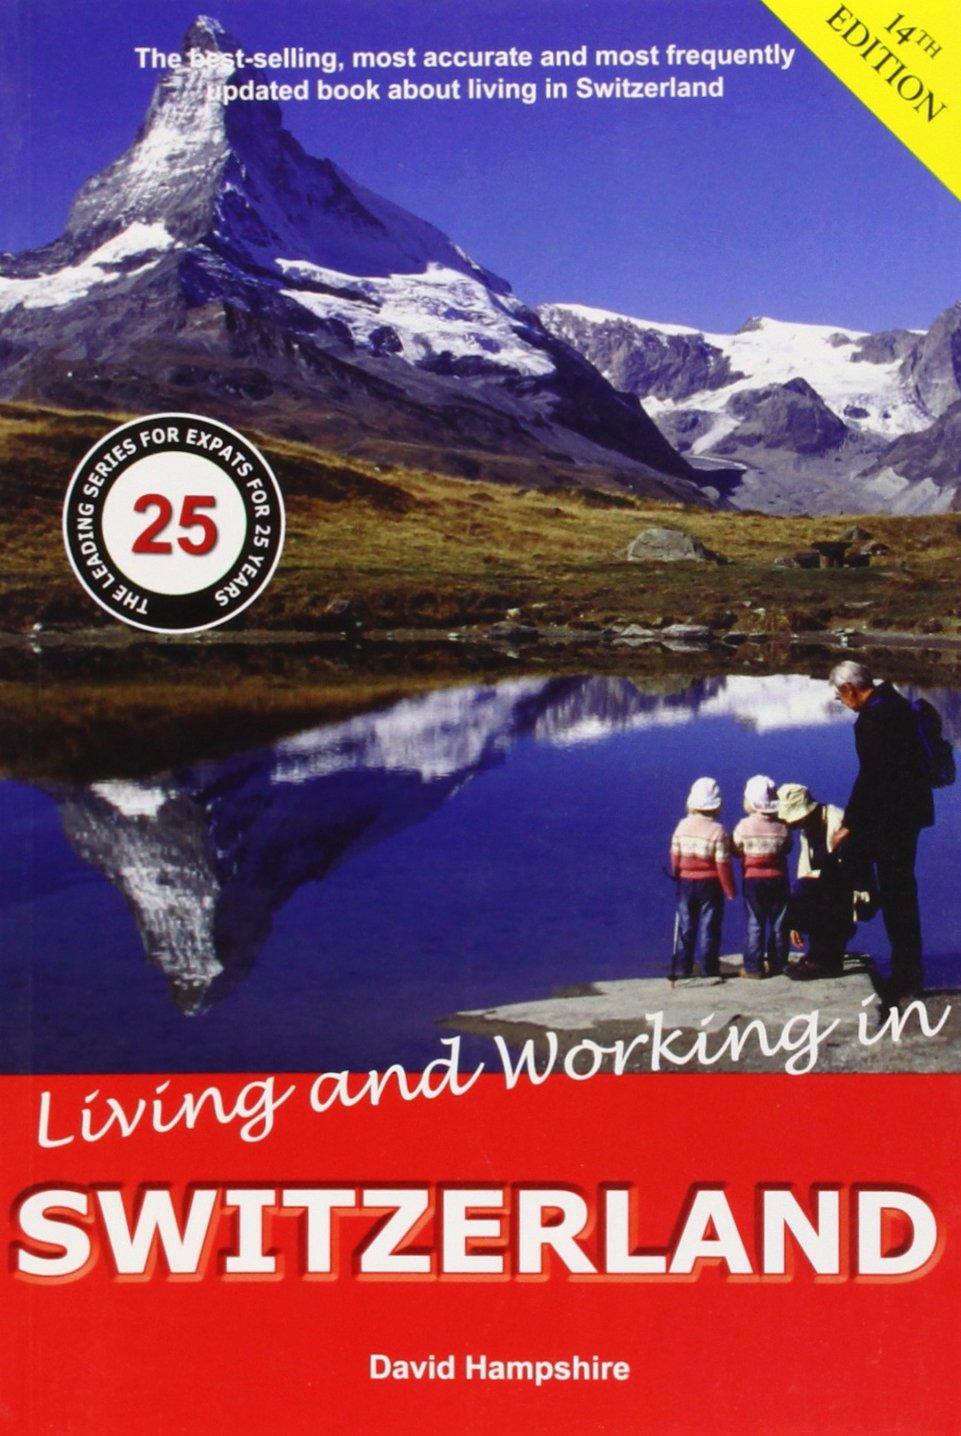 Living and Working in Switzerland: A Survival Handbook